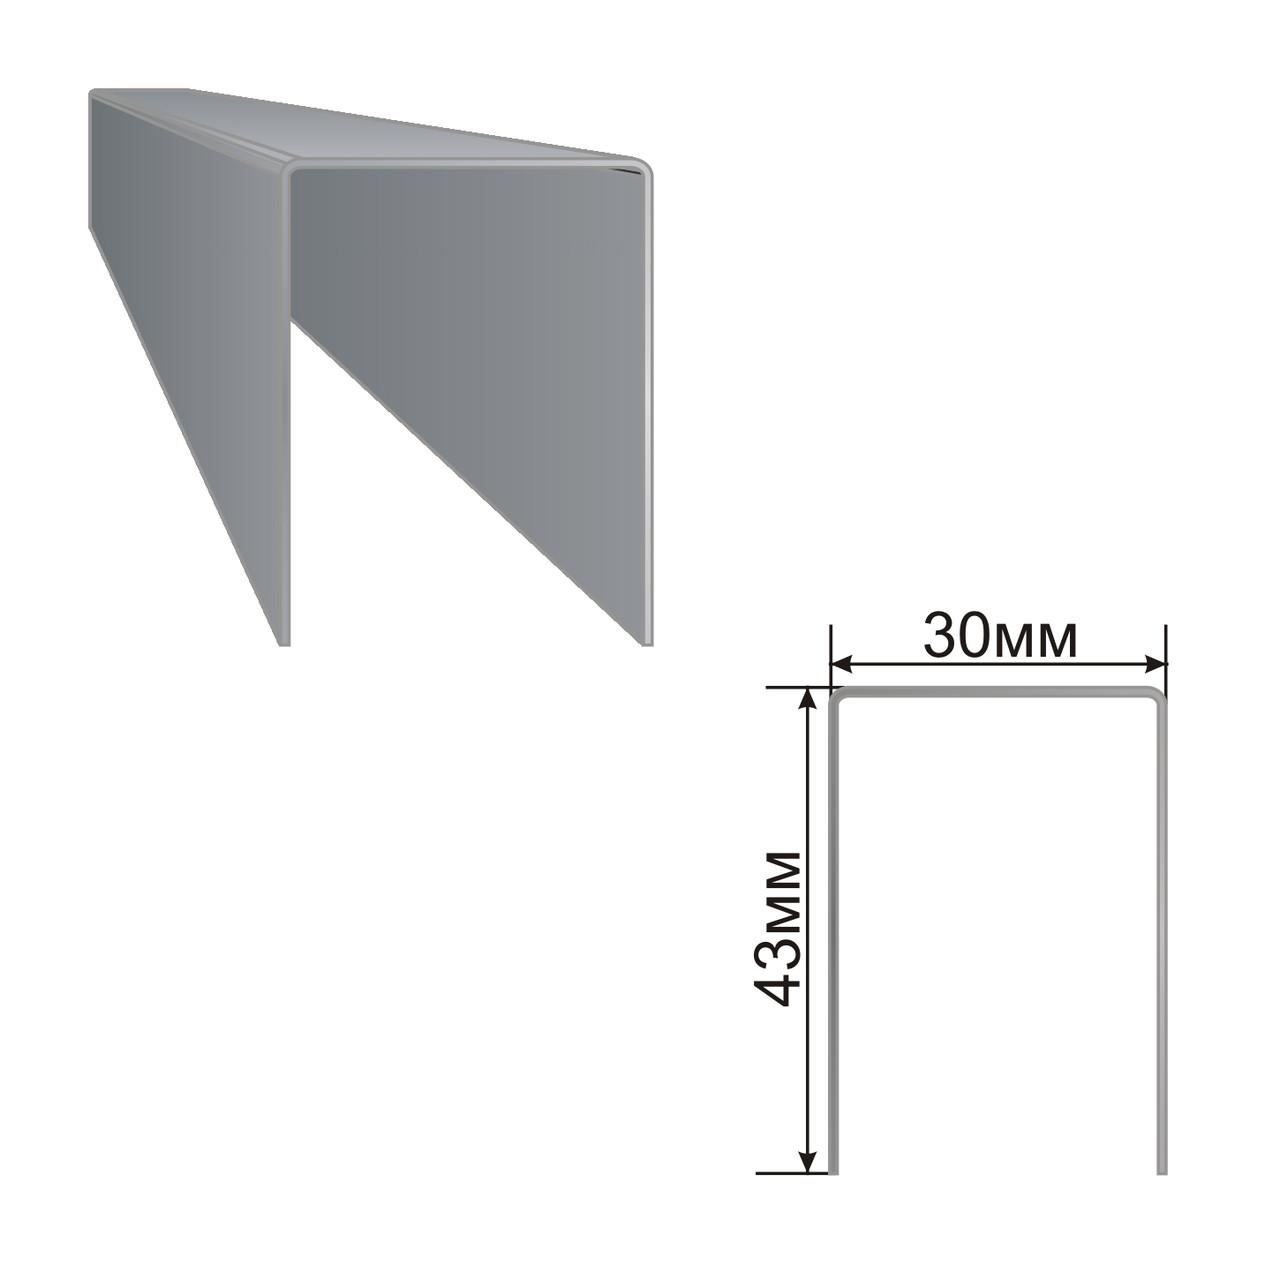 Армирующий профиль для окон ПВХ 43x30x43